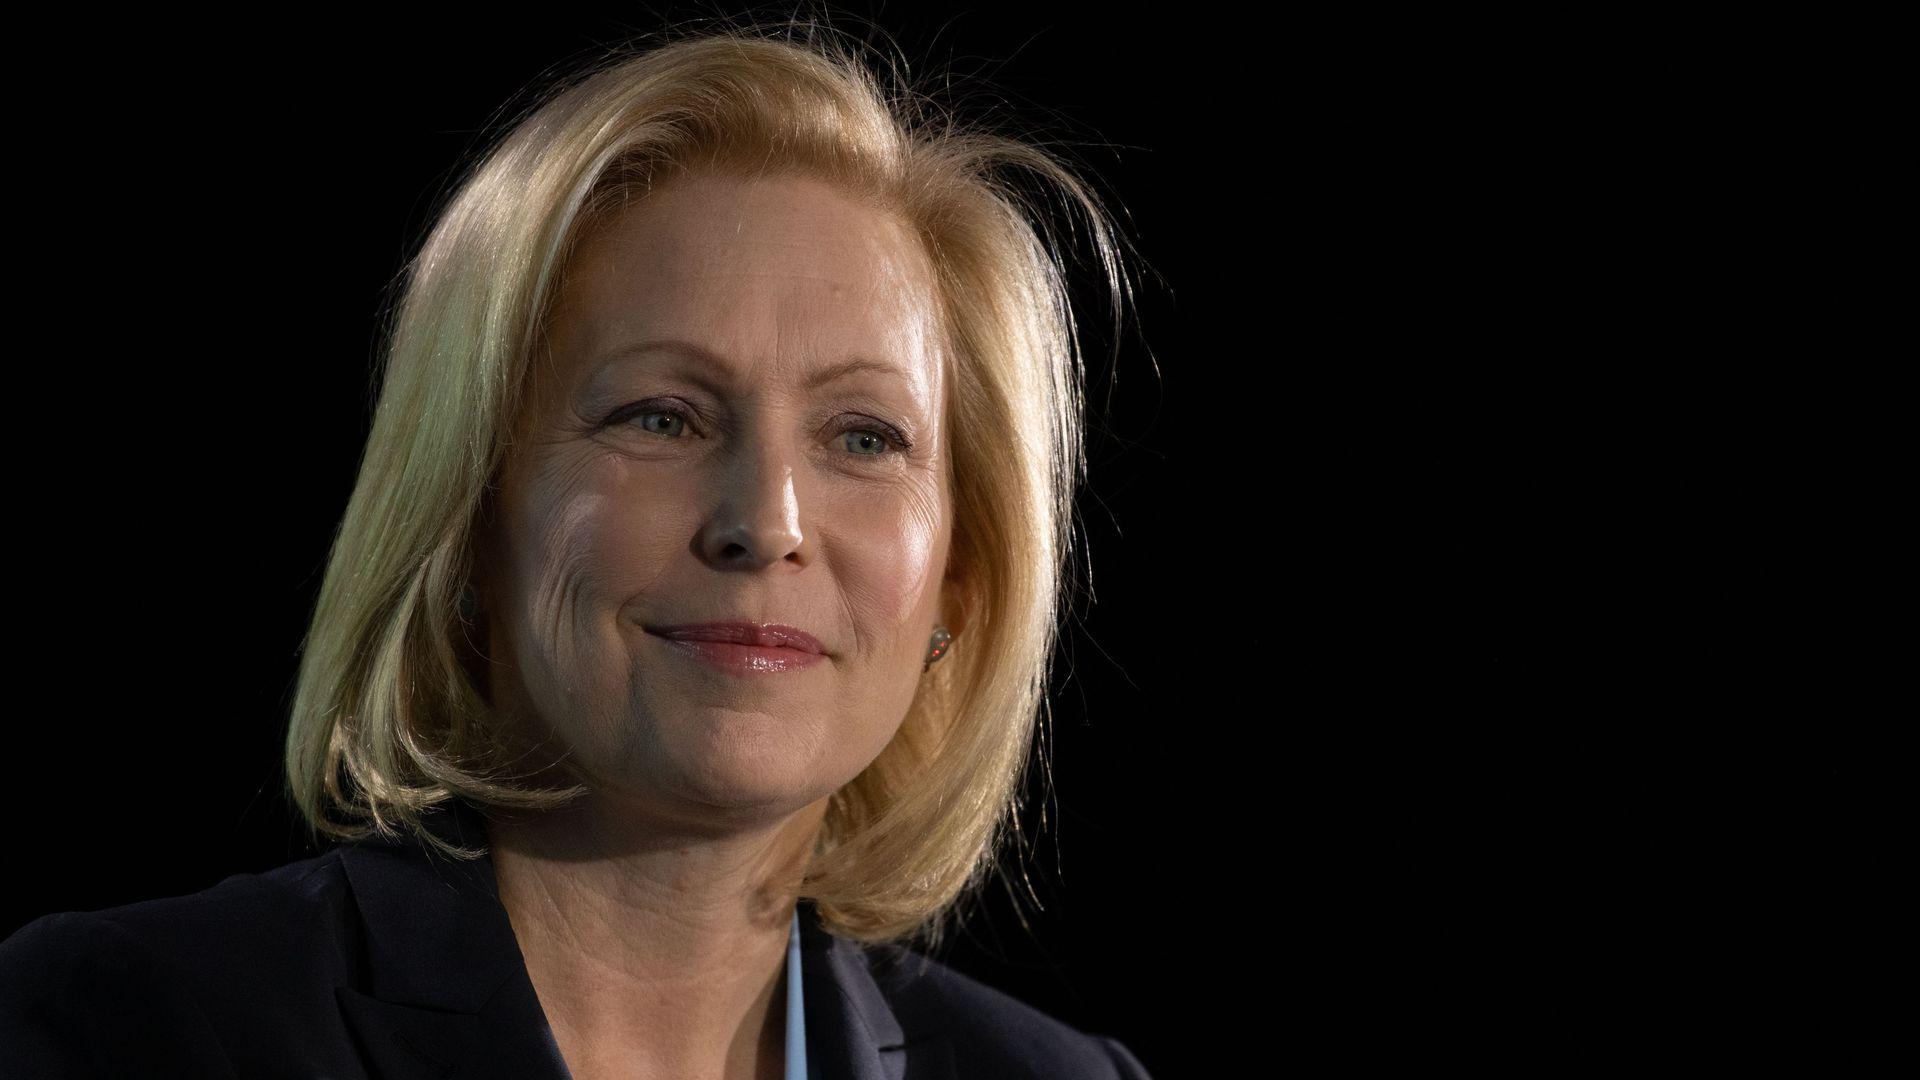 Sen. Kirsten Gillibrand on the Axios stage.